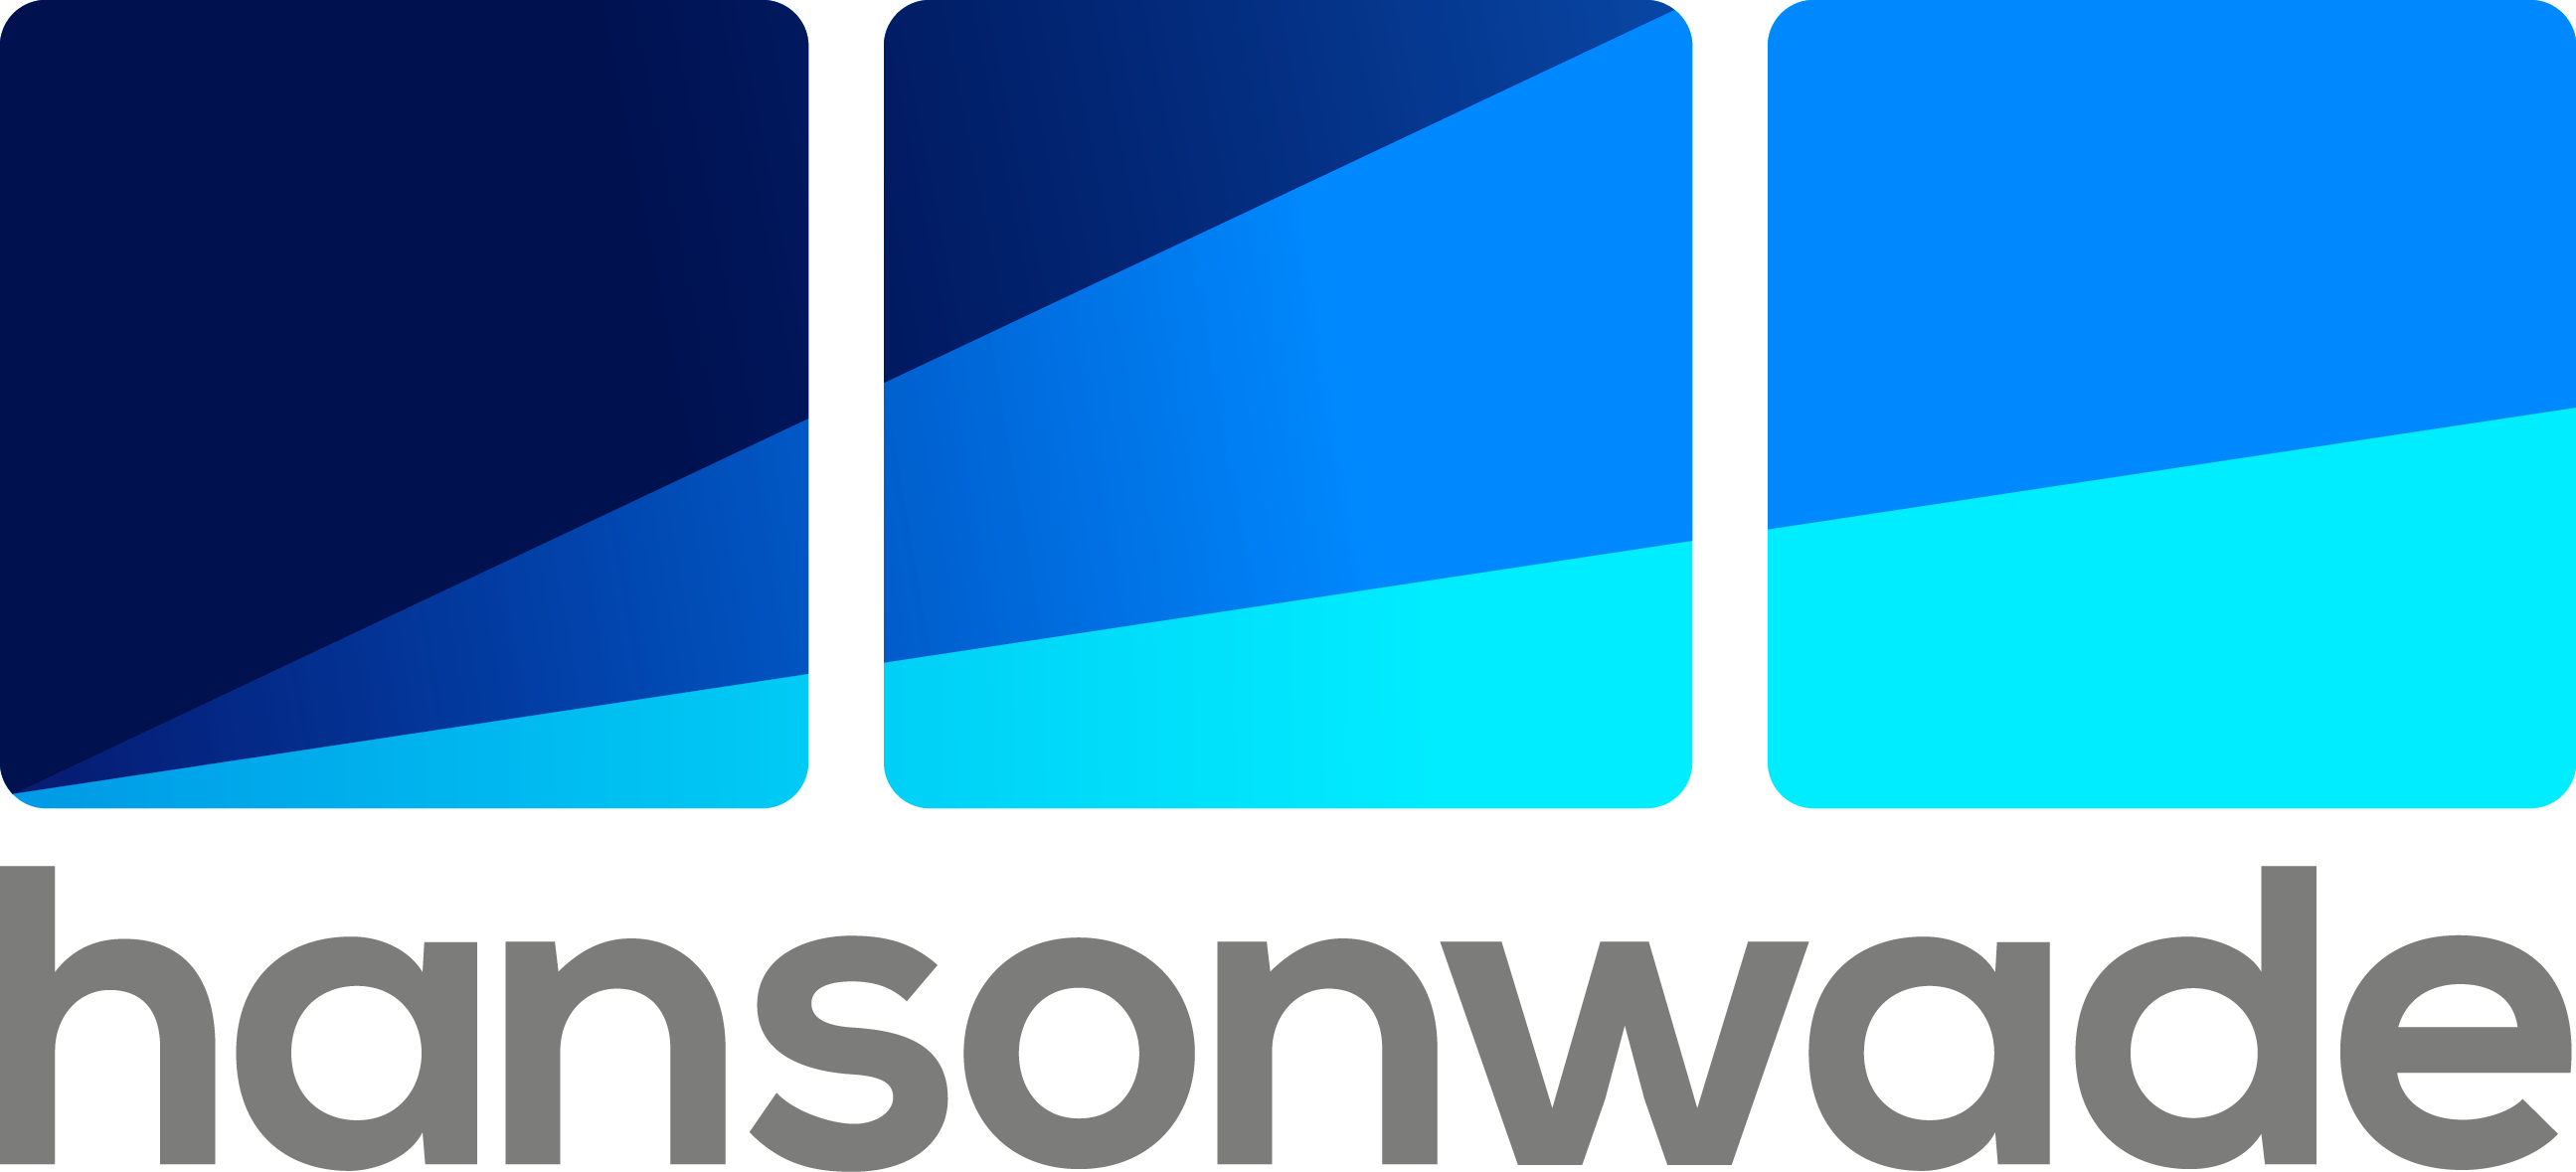 hansonwade_logo_RGB